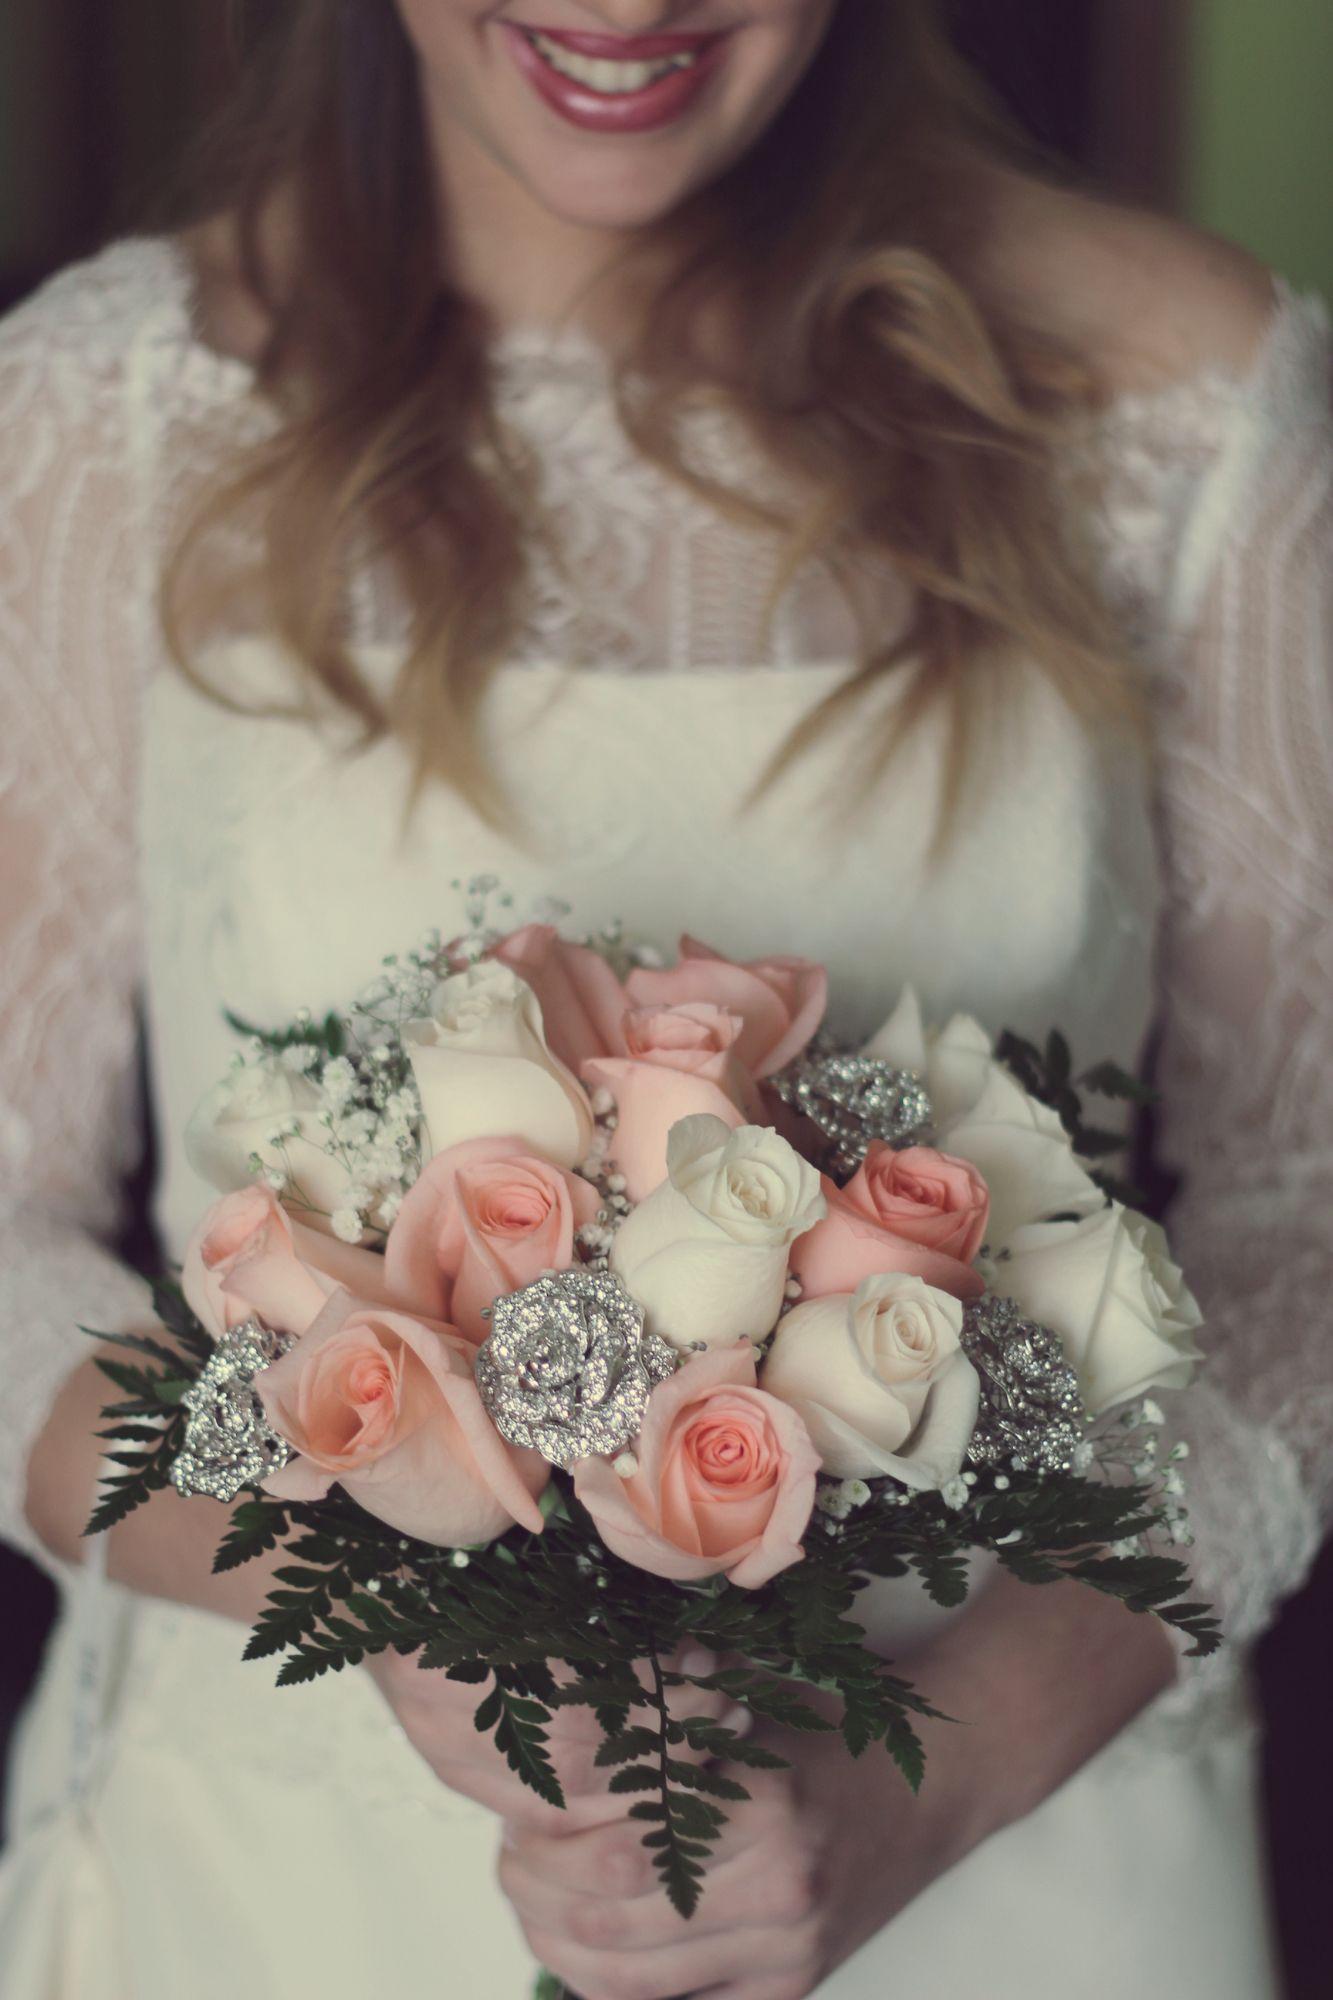 #ramodelanovia, #weddingbouquet